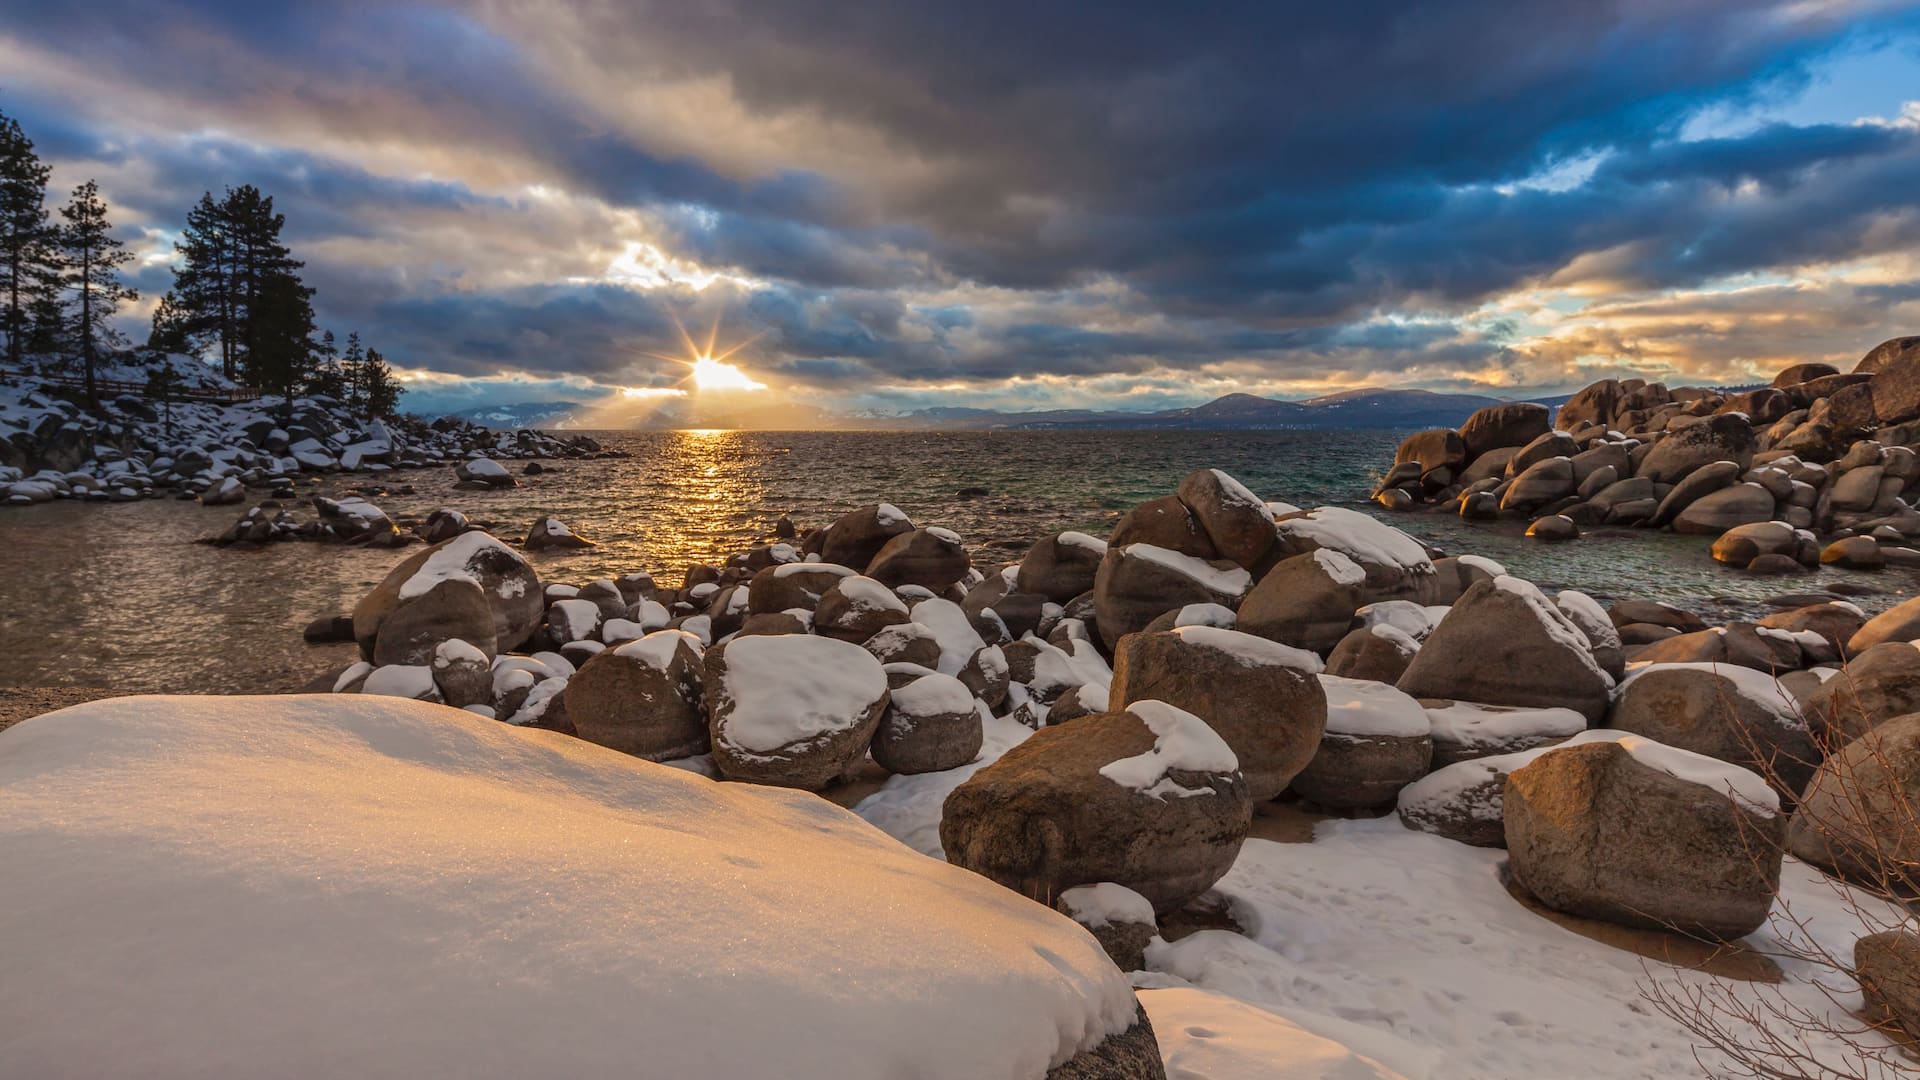 snowy tahoe